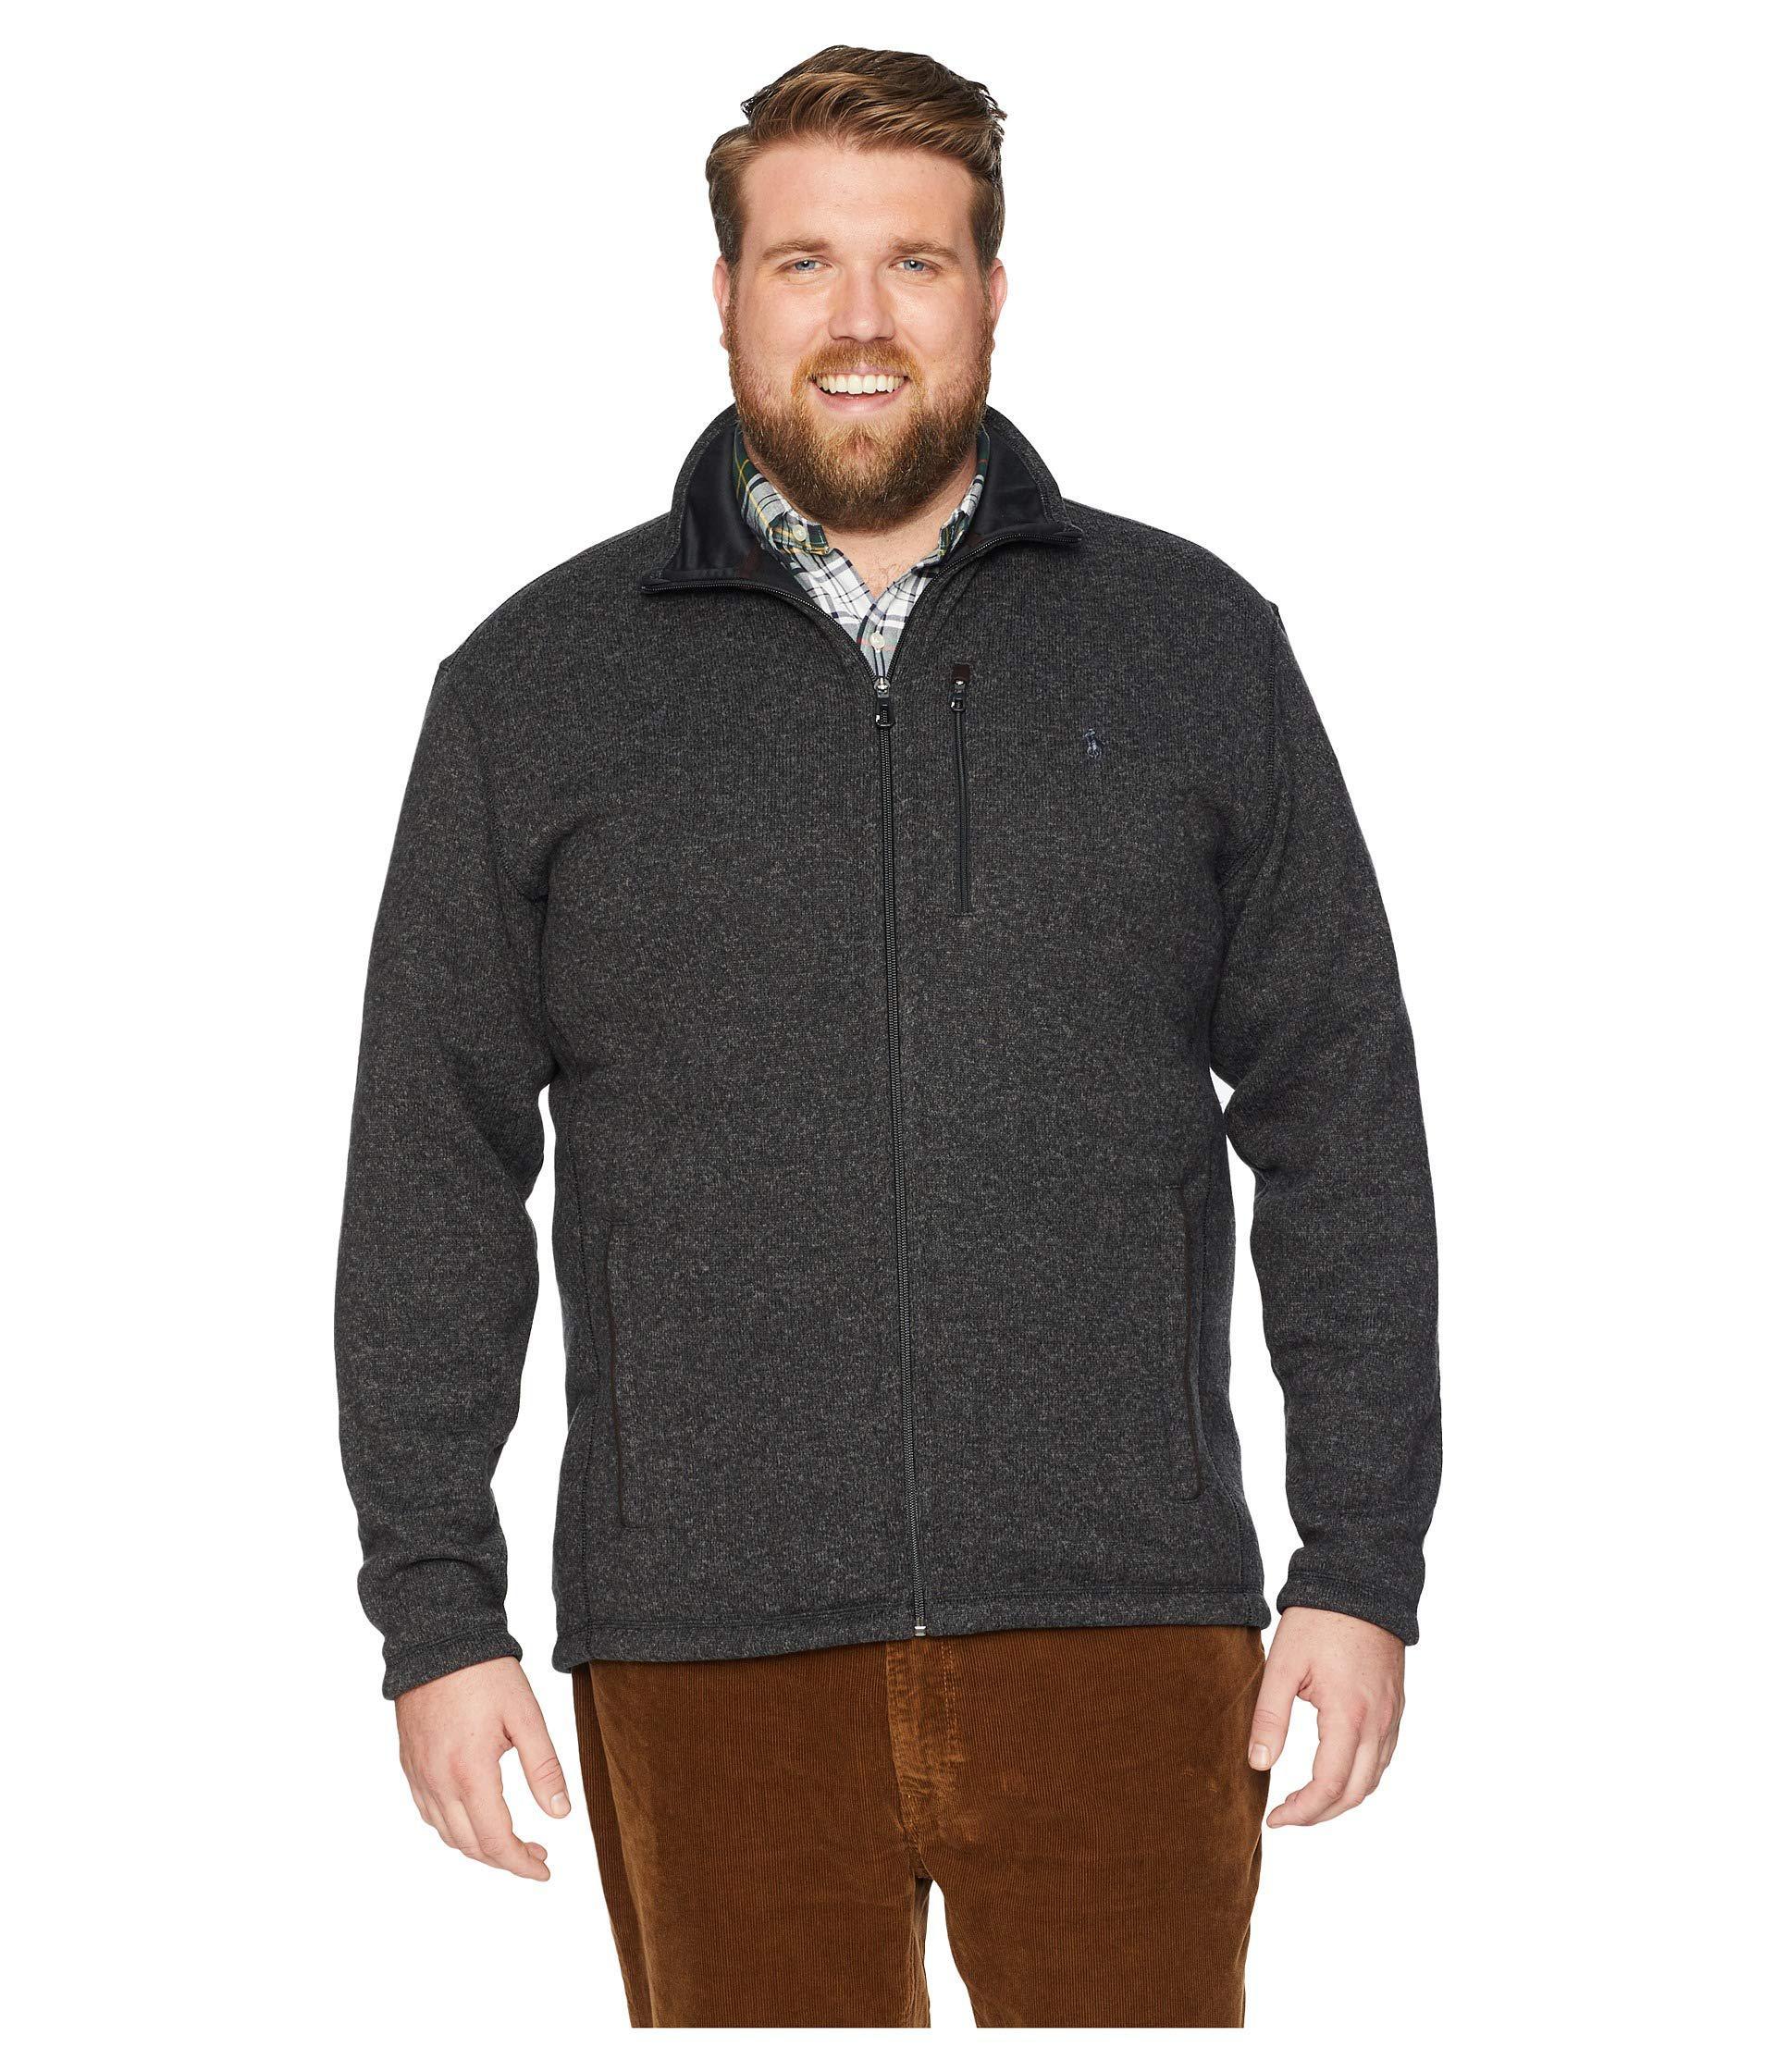 c61fbe8baae Polo Ralph Lauren - Big Tall Sweater Fleece Jacket (black Marl Heather)  Men s Coat. View fullscreen